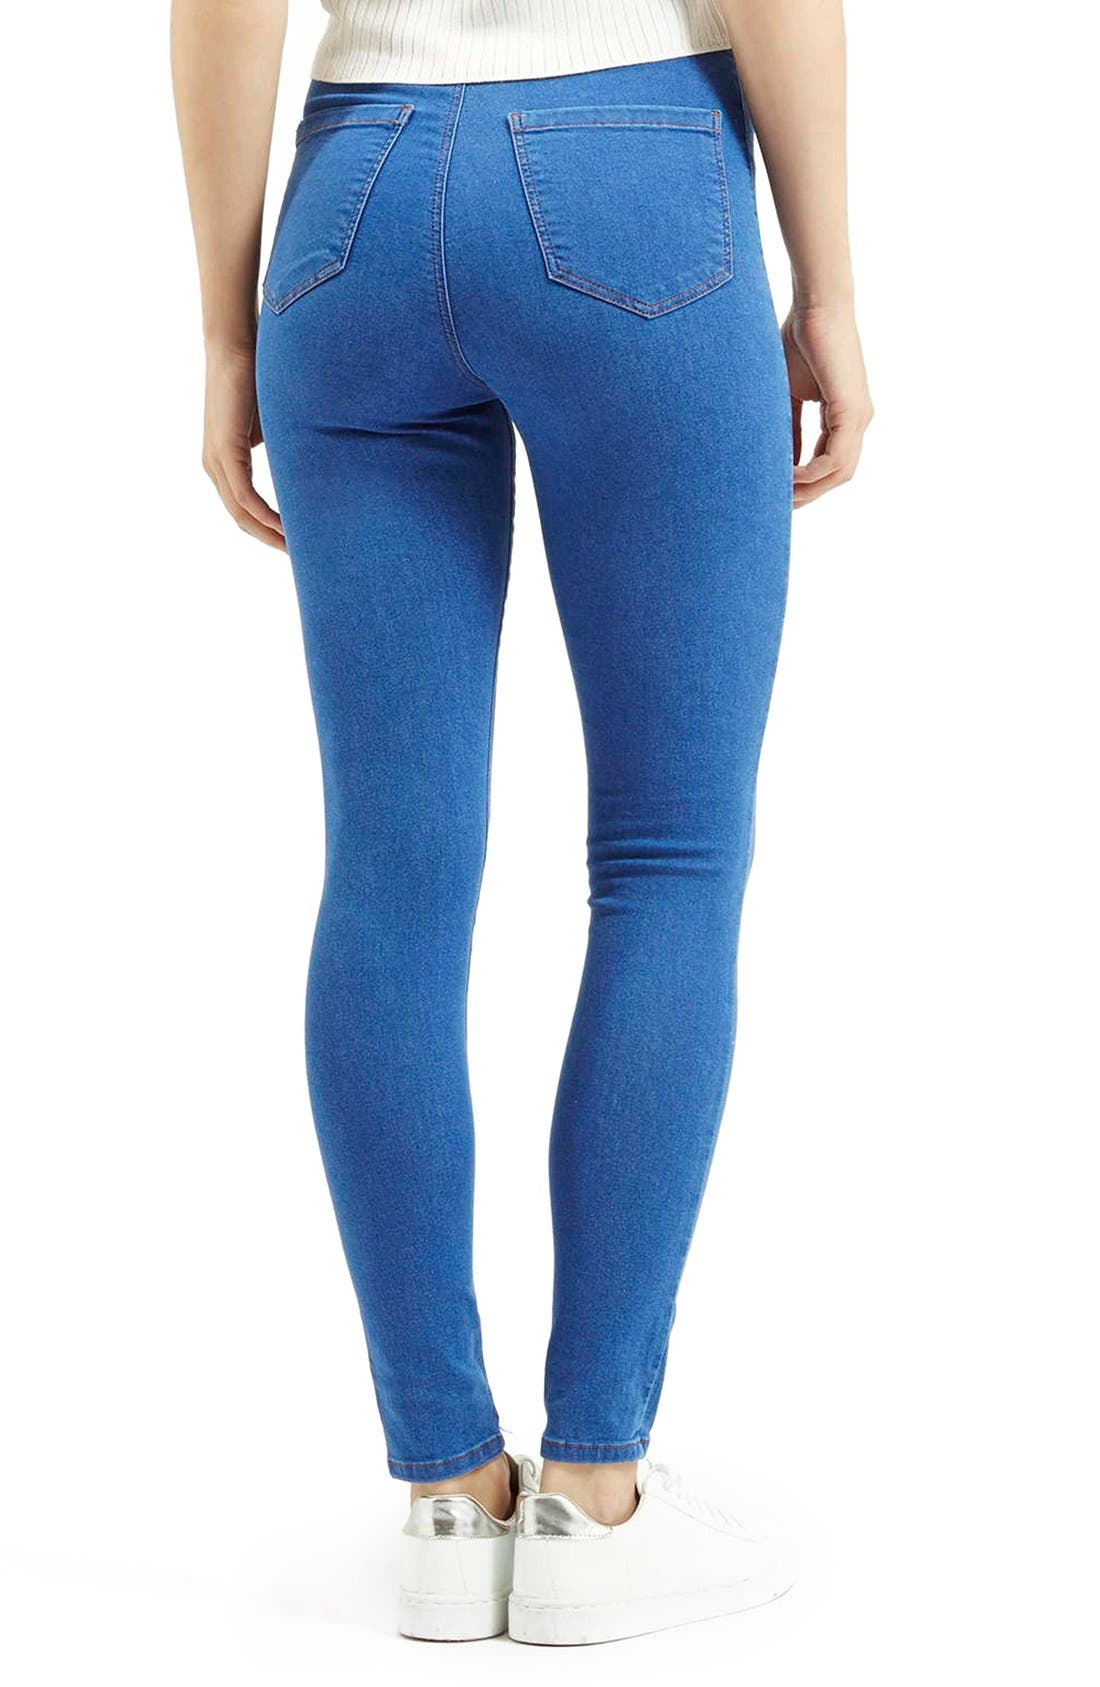 Alternate Image 2  - Topshop Moto 'Joni' High Rise Skinny Jeans (Short)